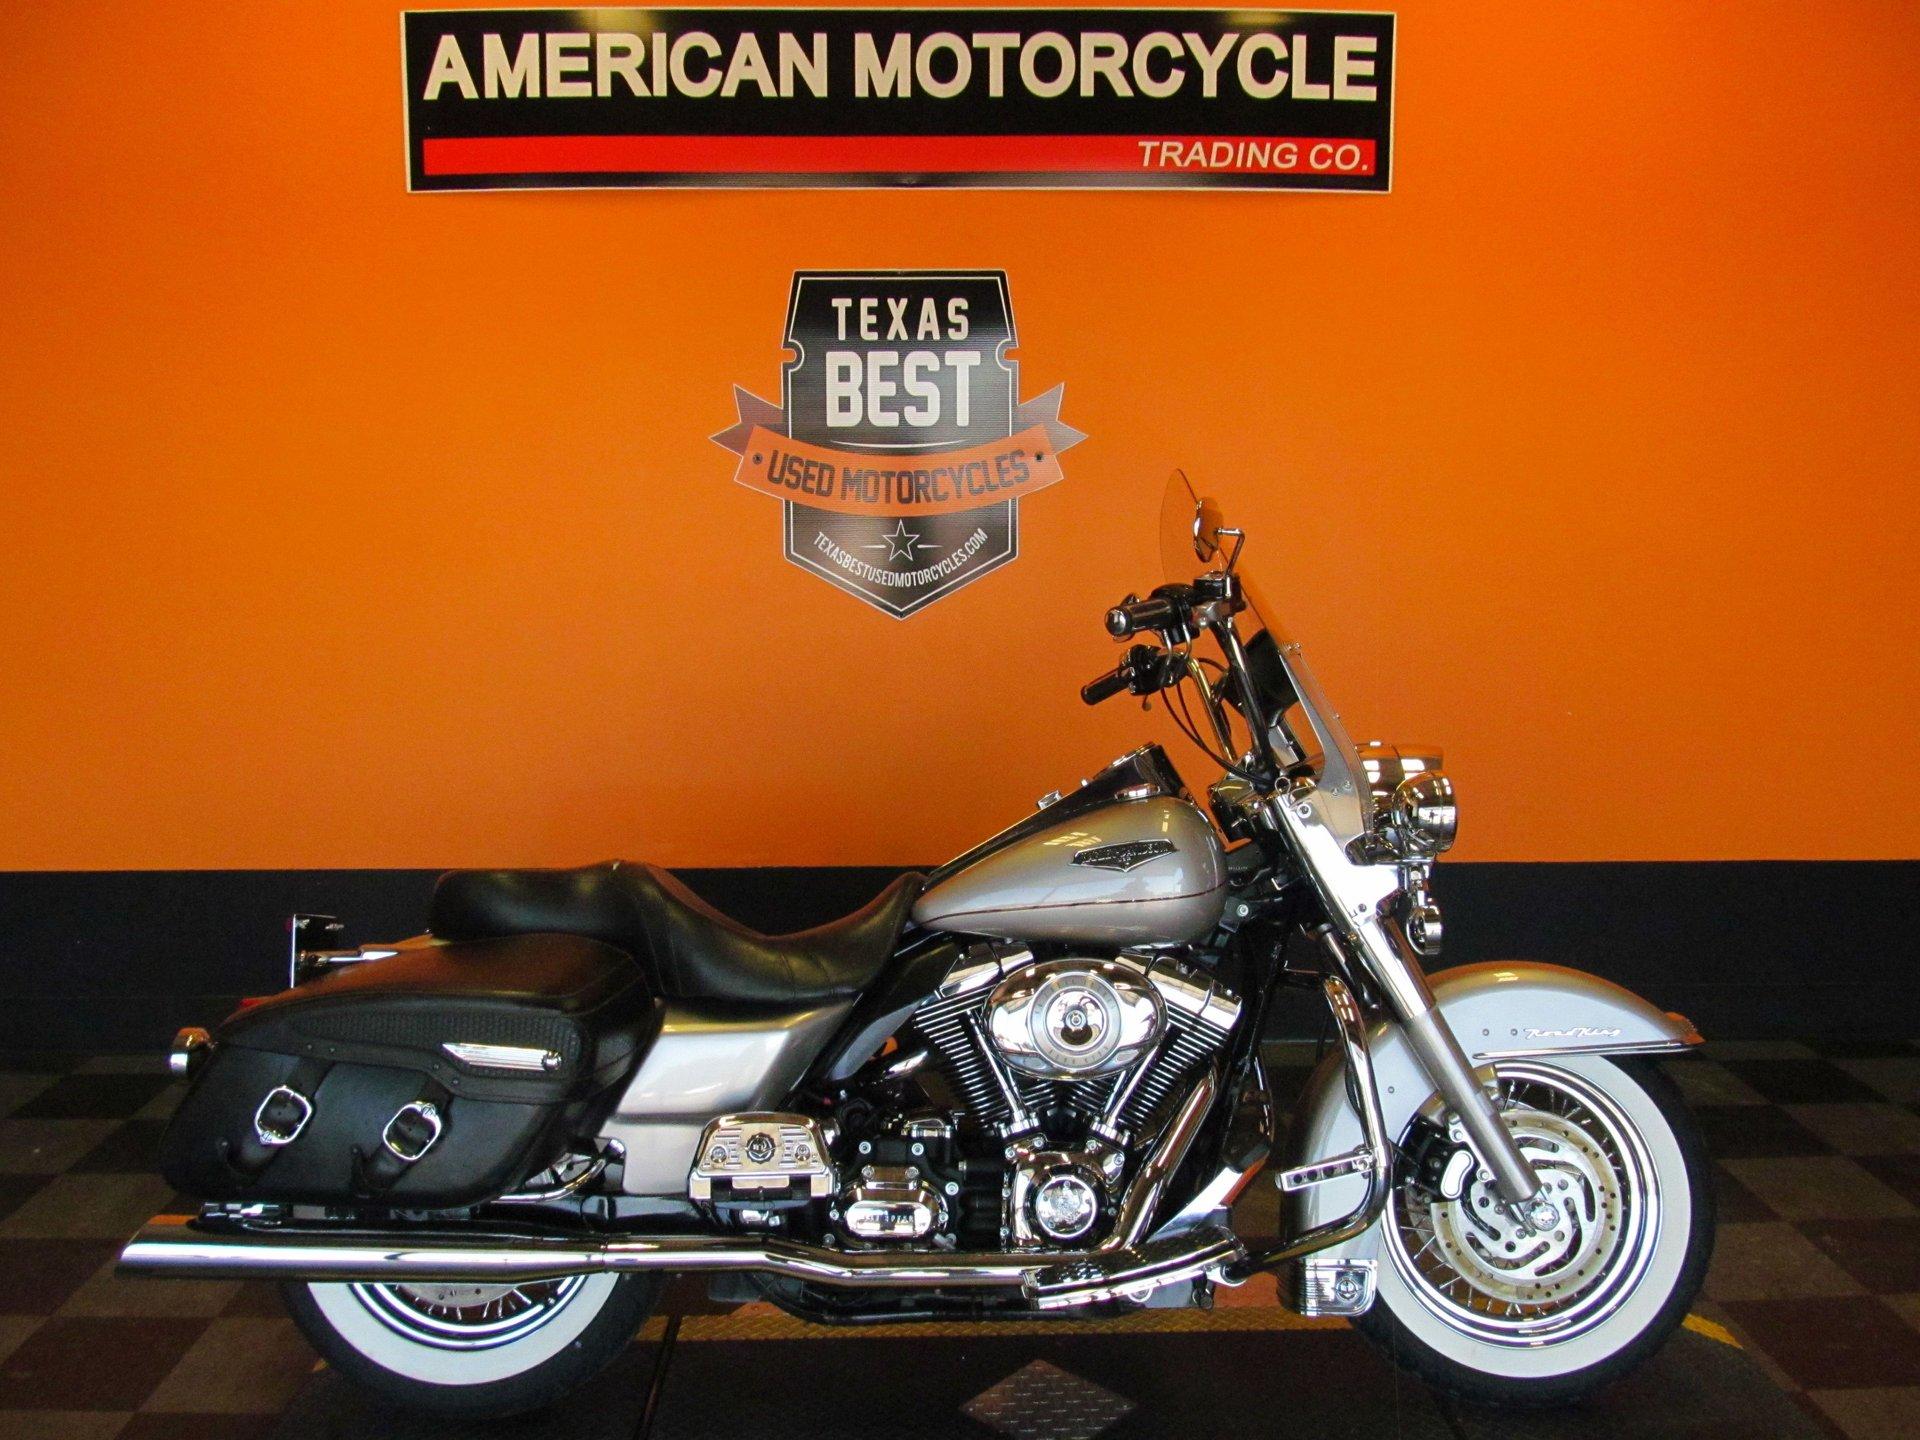 2007 Harley Davidson Road King American Motorcycle Trading Company Used Harley Davidson Motorcycles